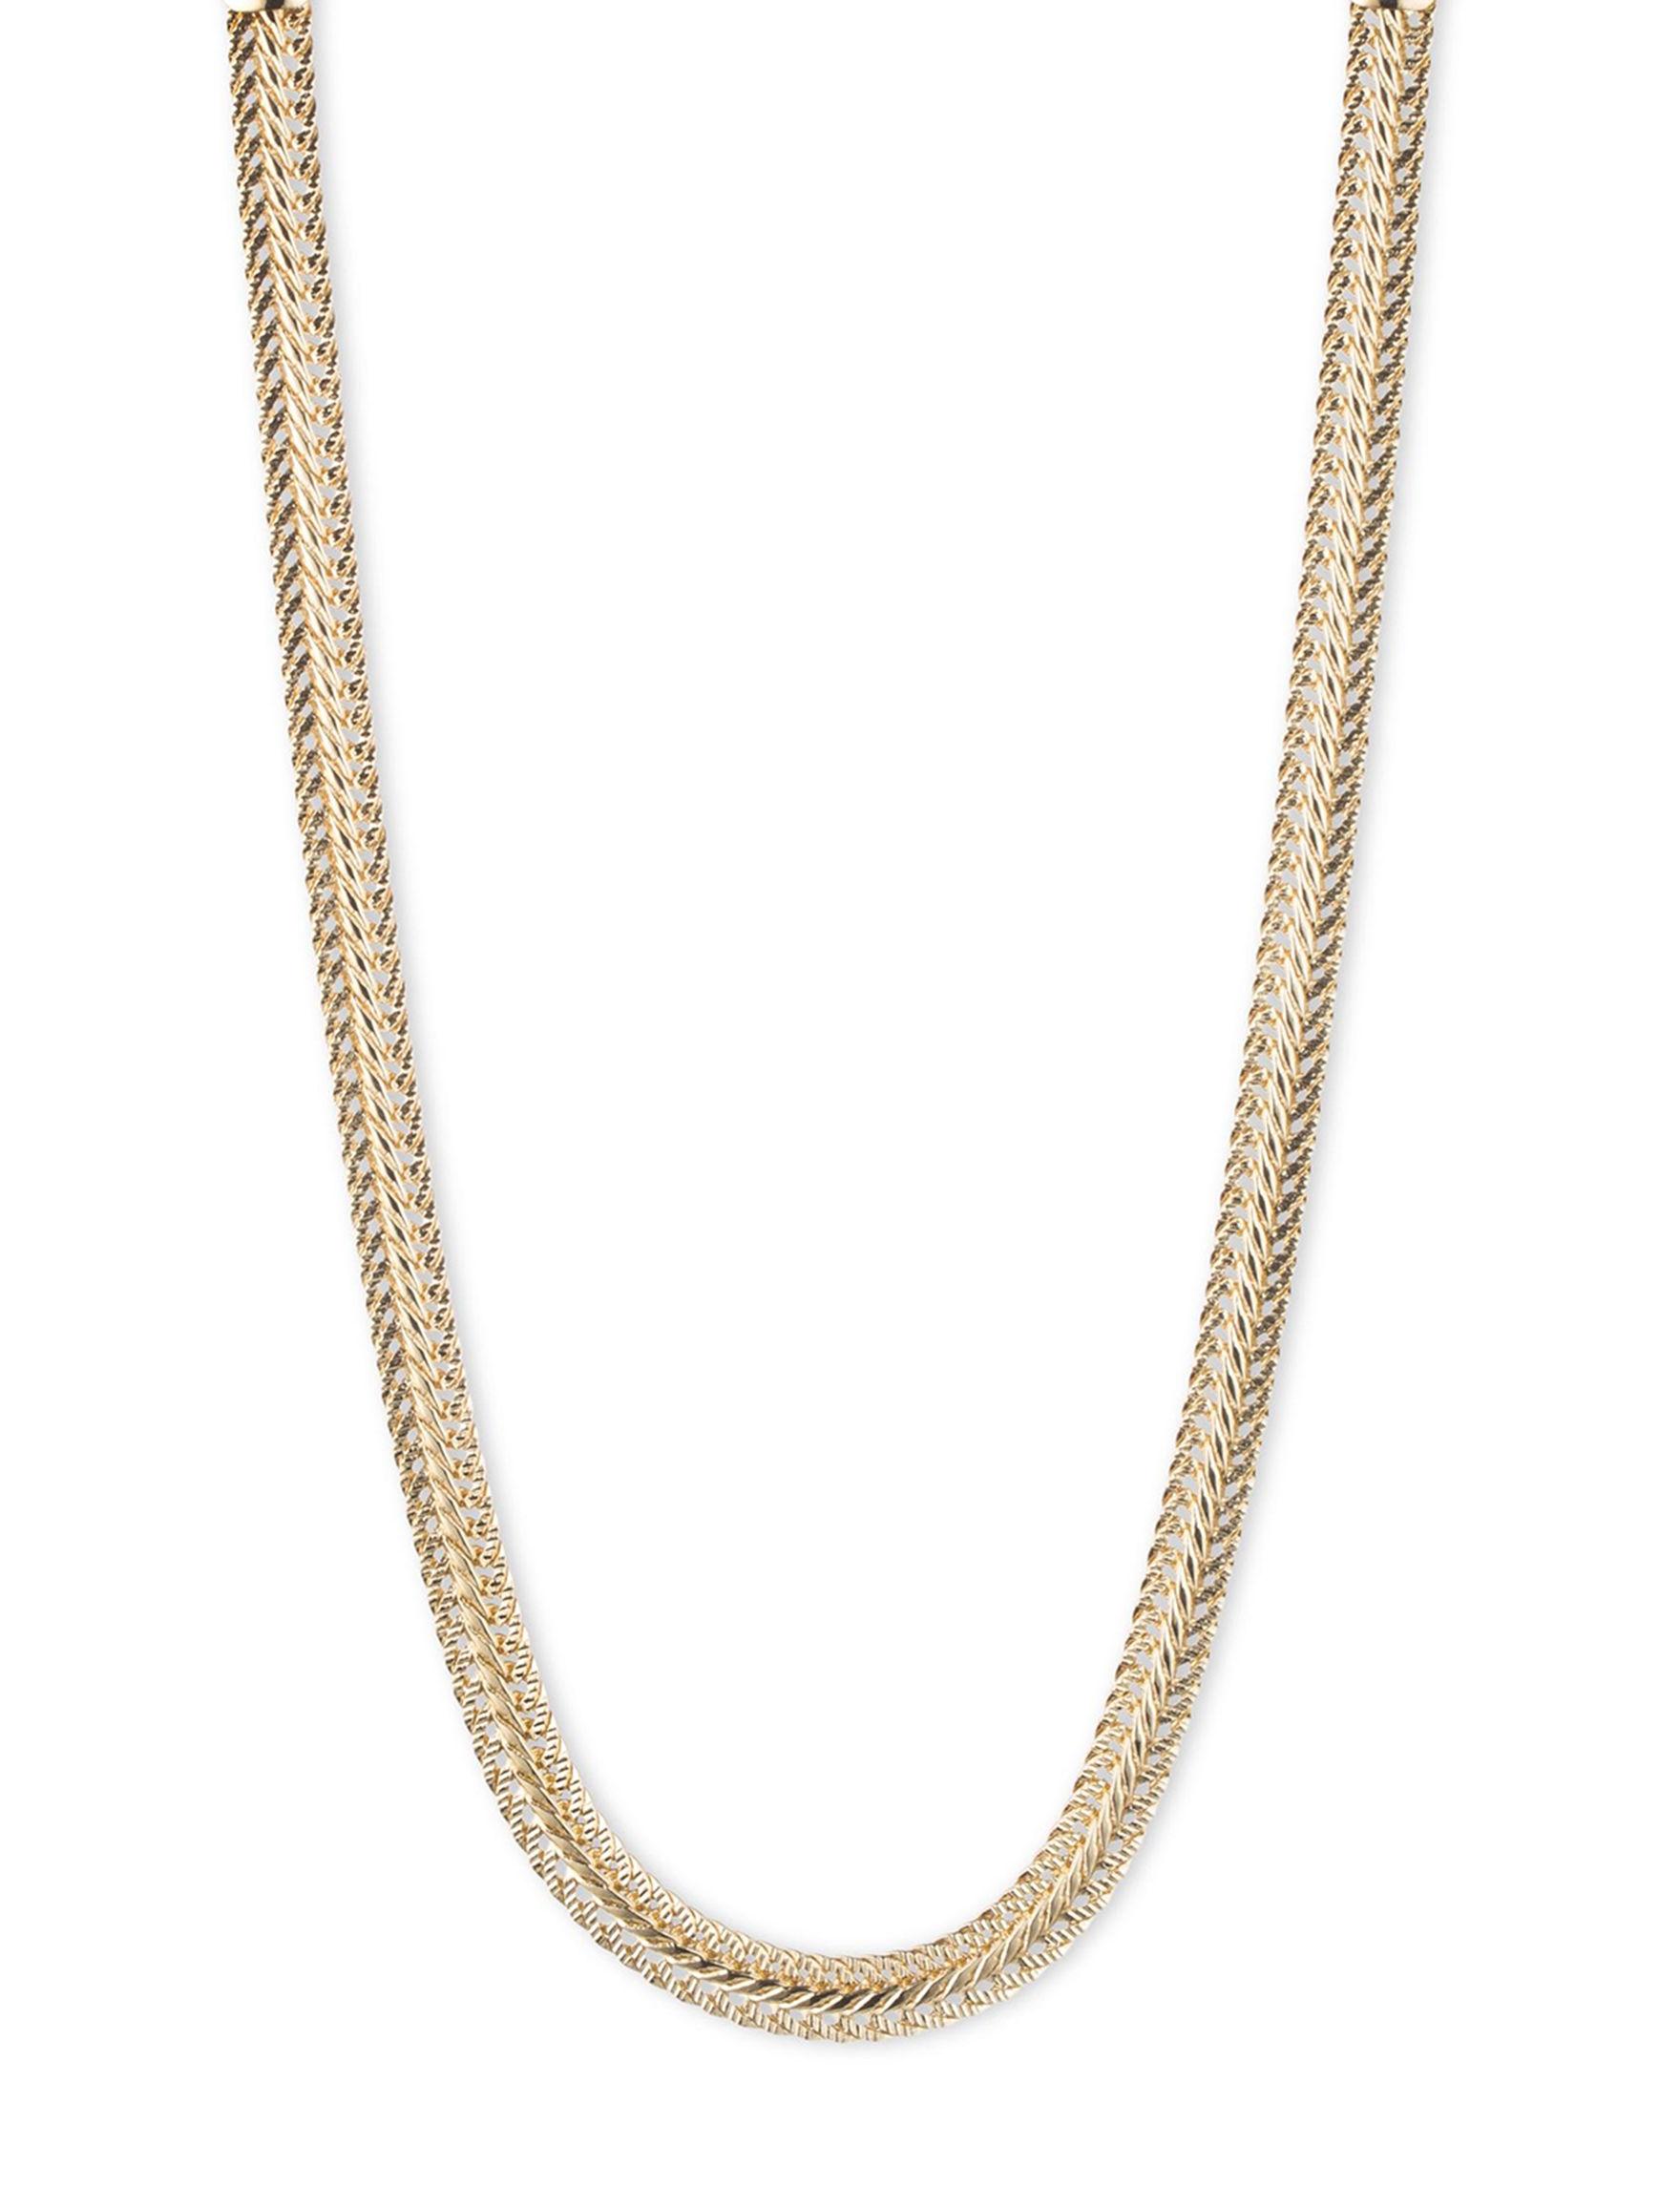 Anne Klein Gold Necklaces & Pendants Fashion Jewelry